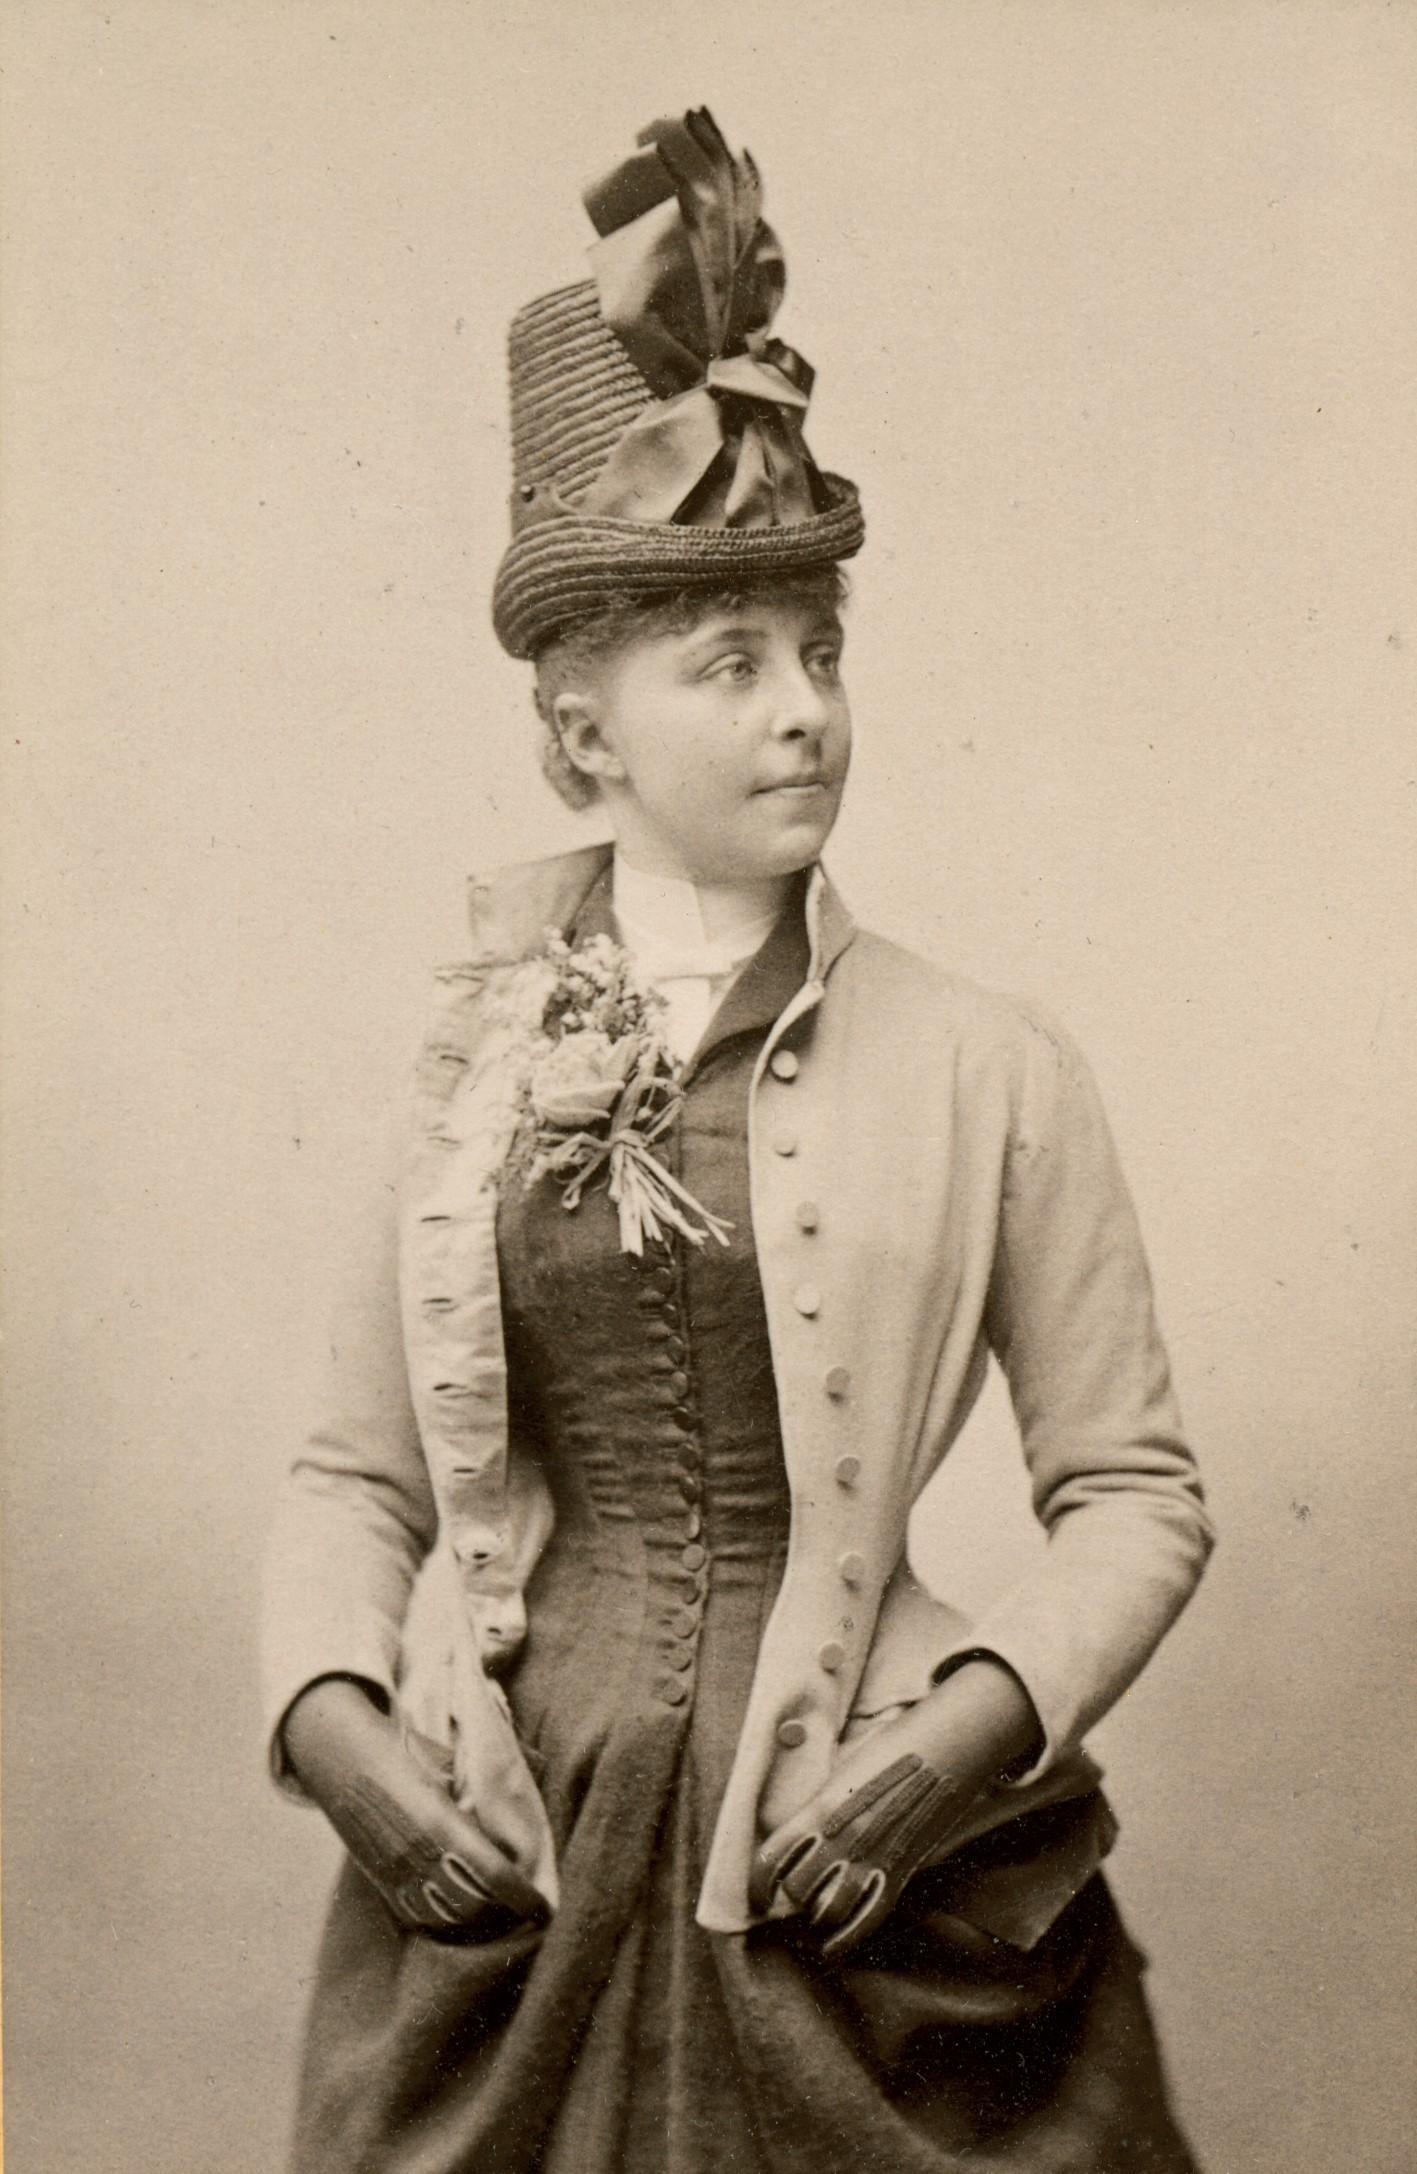 Ellen Hartman-Cederström as Gerda in the Royal Dramatic Theatre production of Sveas Fana, 1888. Photo: Gösta Florman (1831-1900). Musik- och teaterbiblioteket, Stockholm (H3_200)